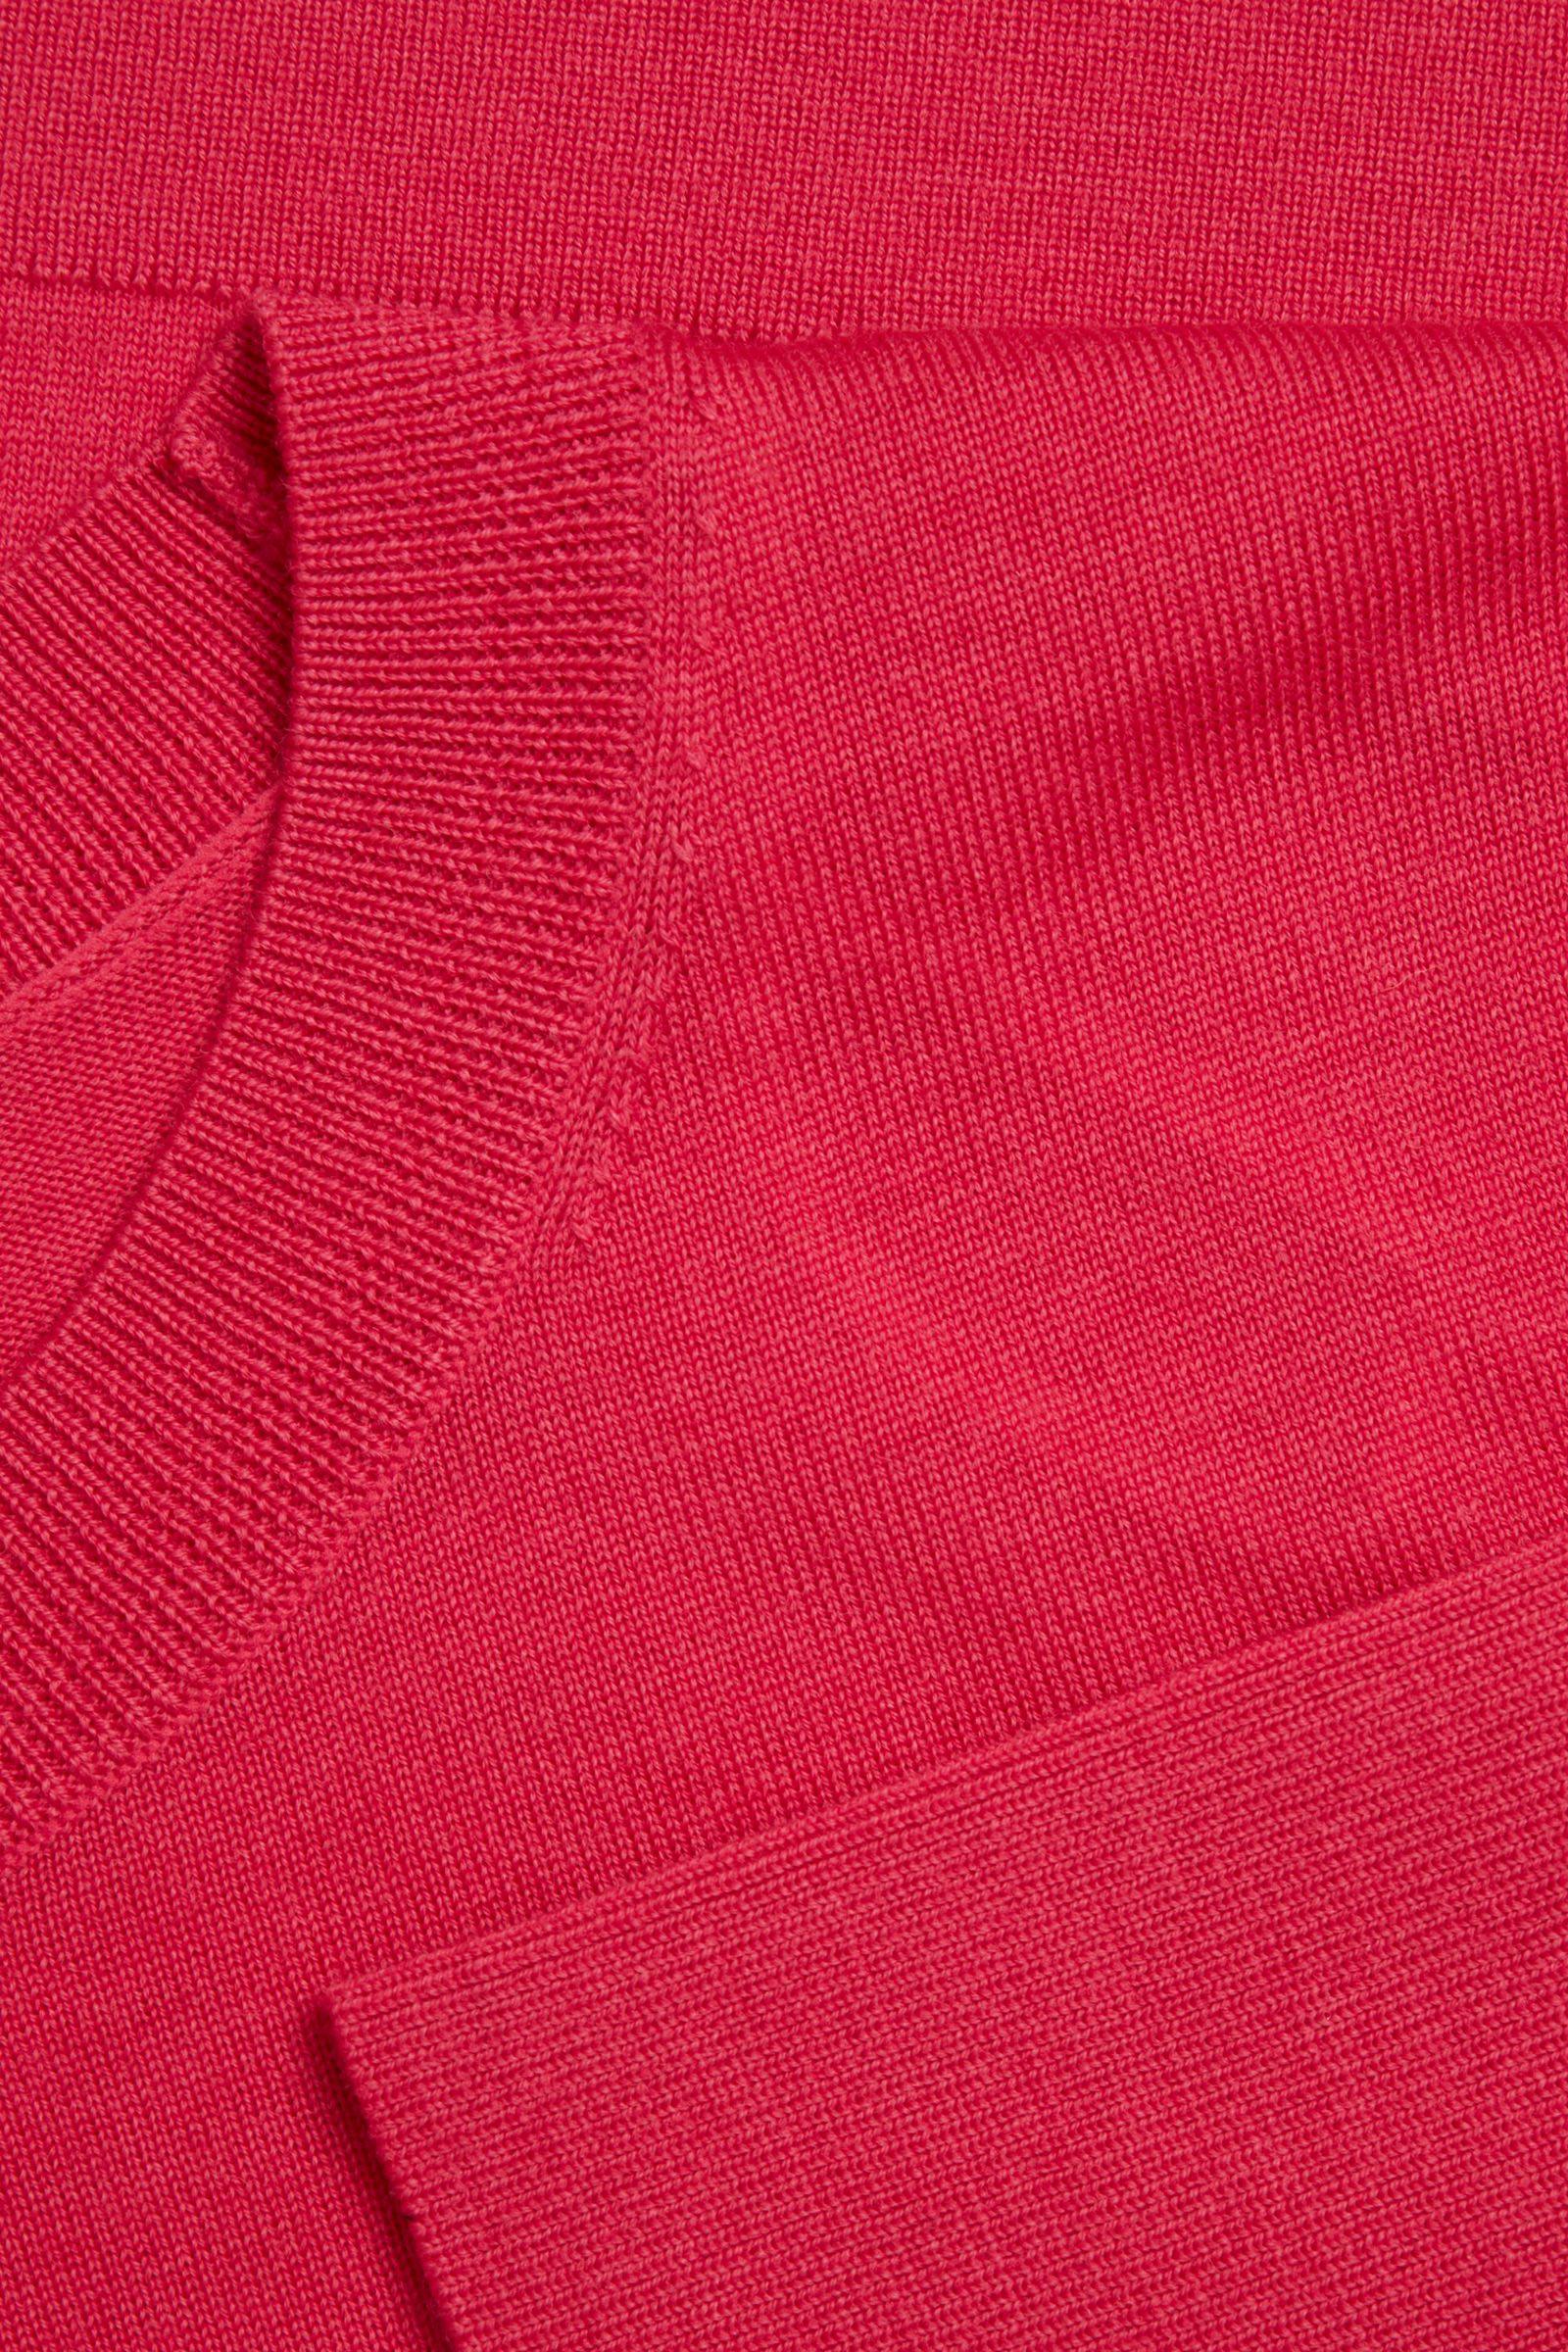 COS 메리노 울 크루 넥 스웨터의 핑크컬러 Detail입니다.